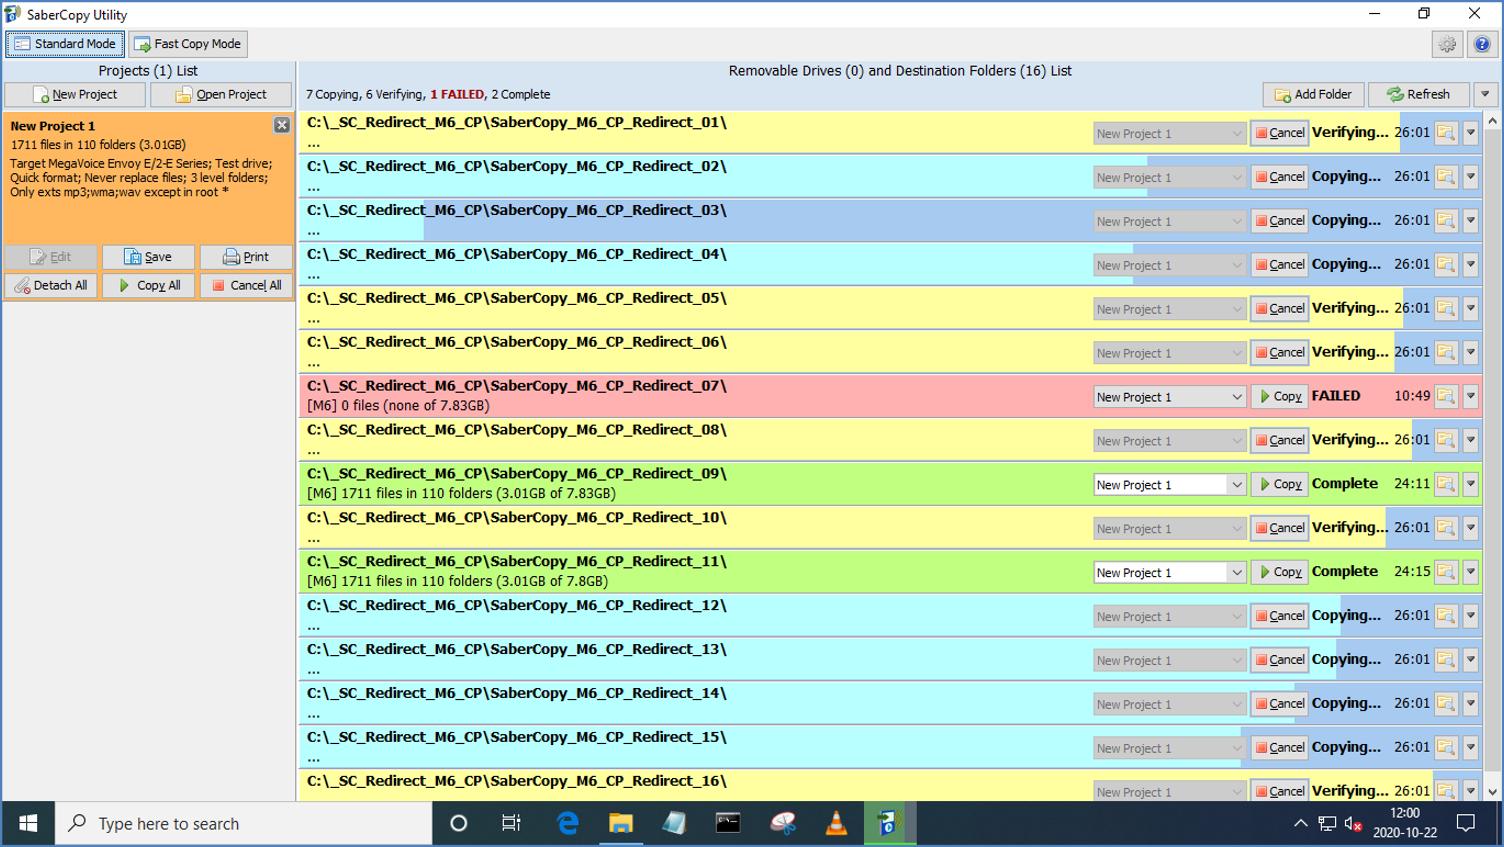 MegaVoice SaberCopy - Screenshot 12